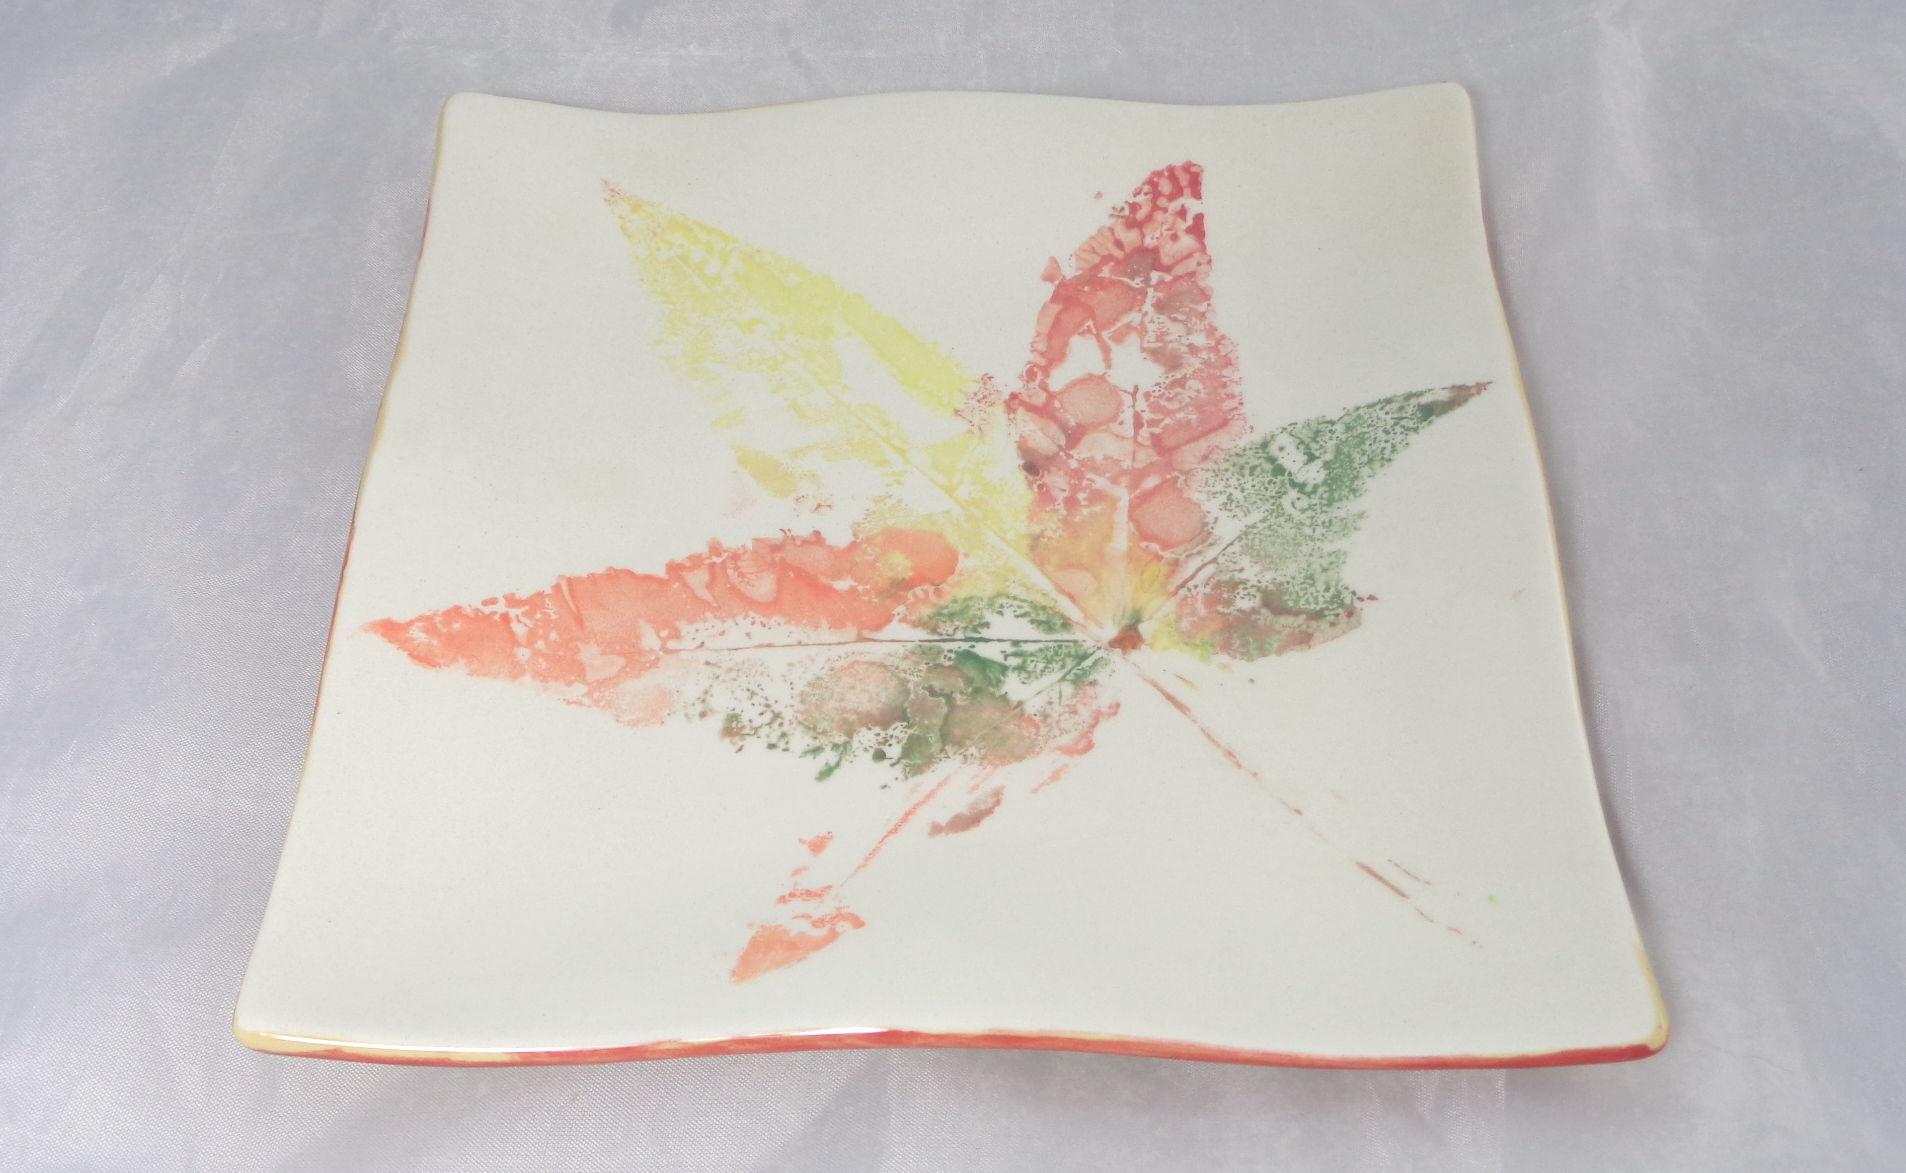 Bemalte Keramik Wellenteller Herbstblatt